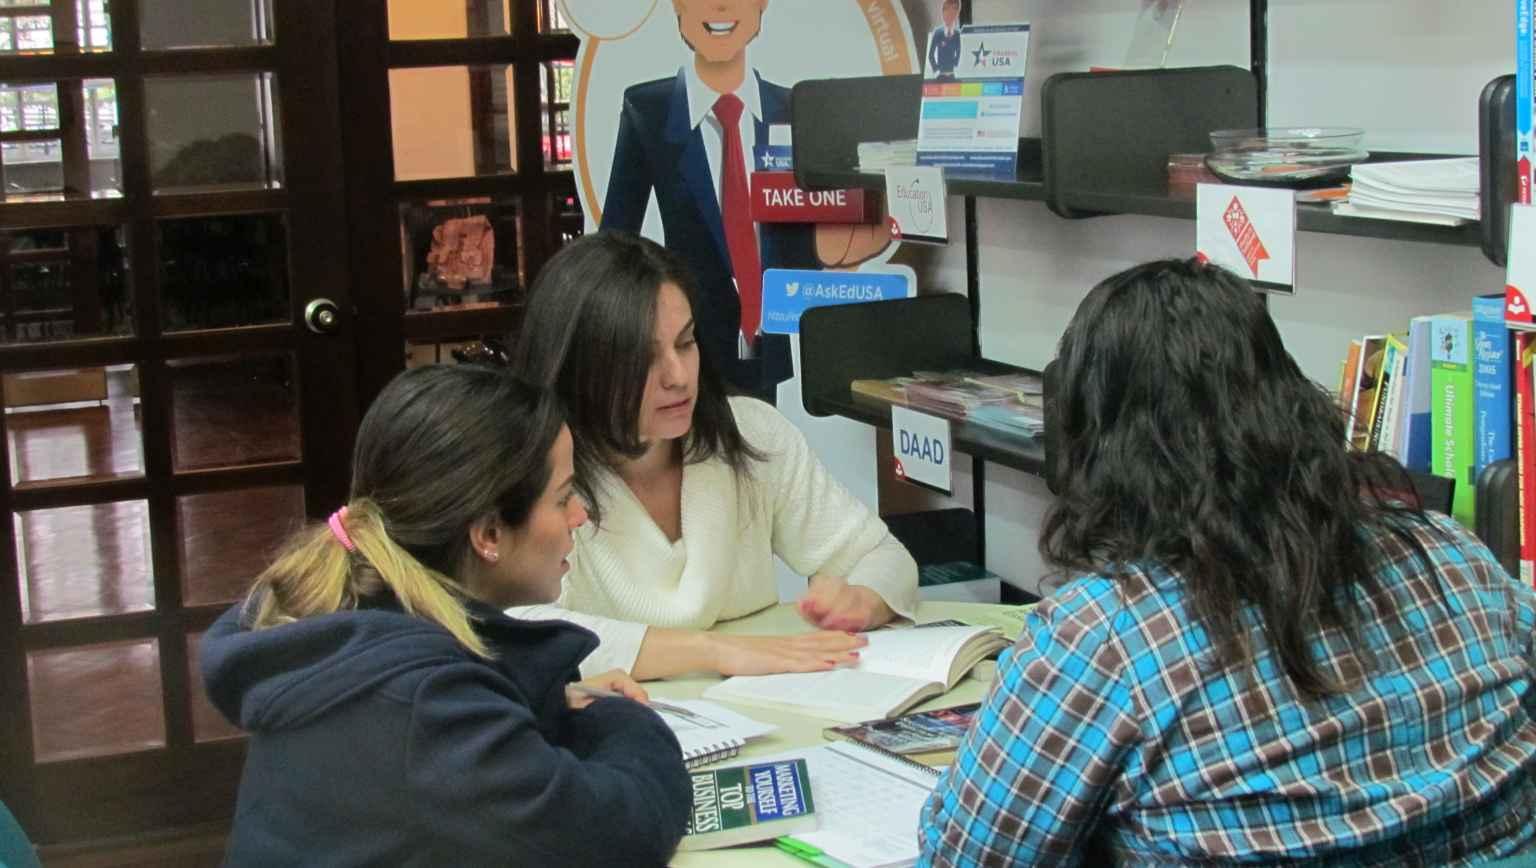 EducationUSA Colfuturo Advising Center for international students